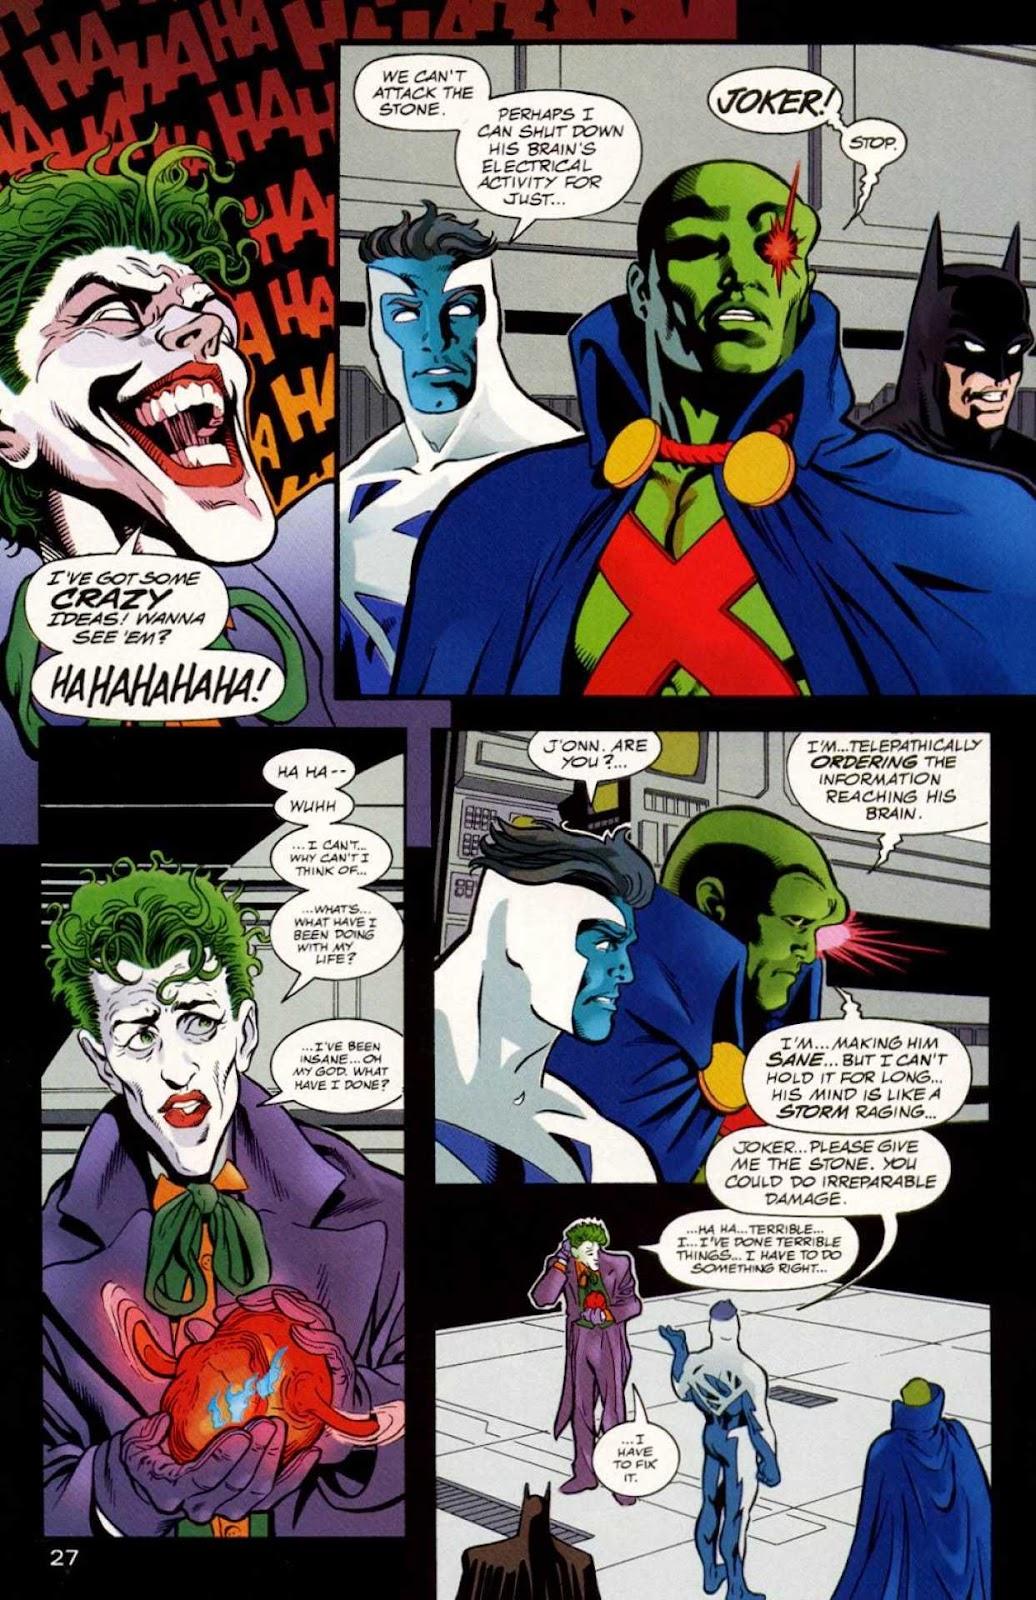 Martian Manhunter temporally cures the Joker [JLA #15] : justiceleague